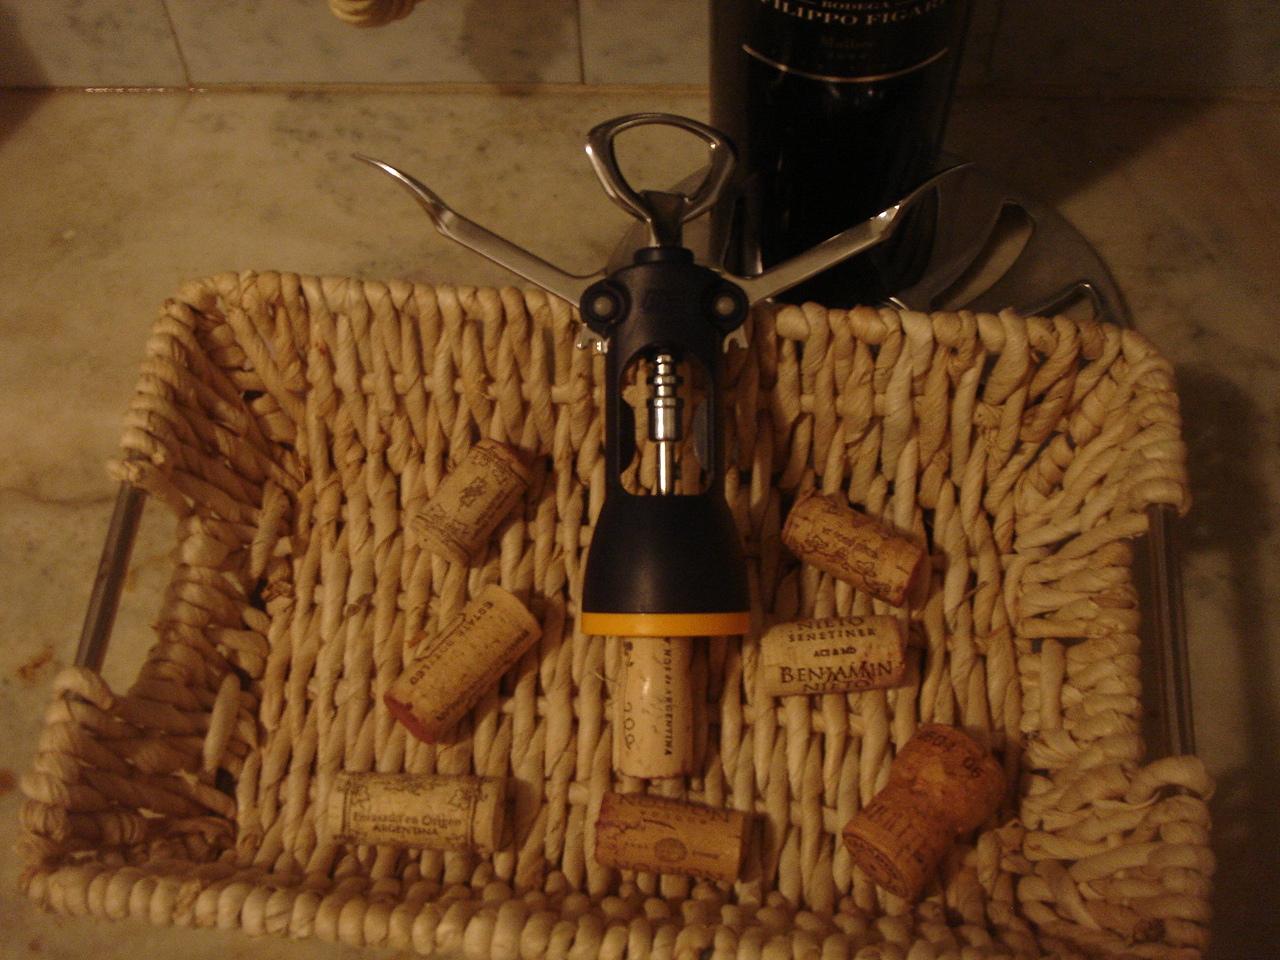 Gargoyle Wall Mounted Bottle Opener Sliding Window Pane